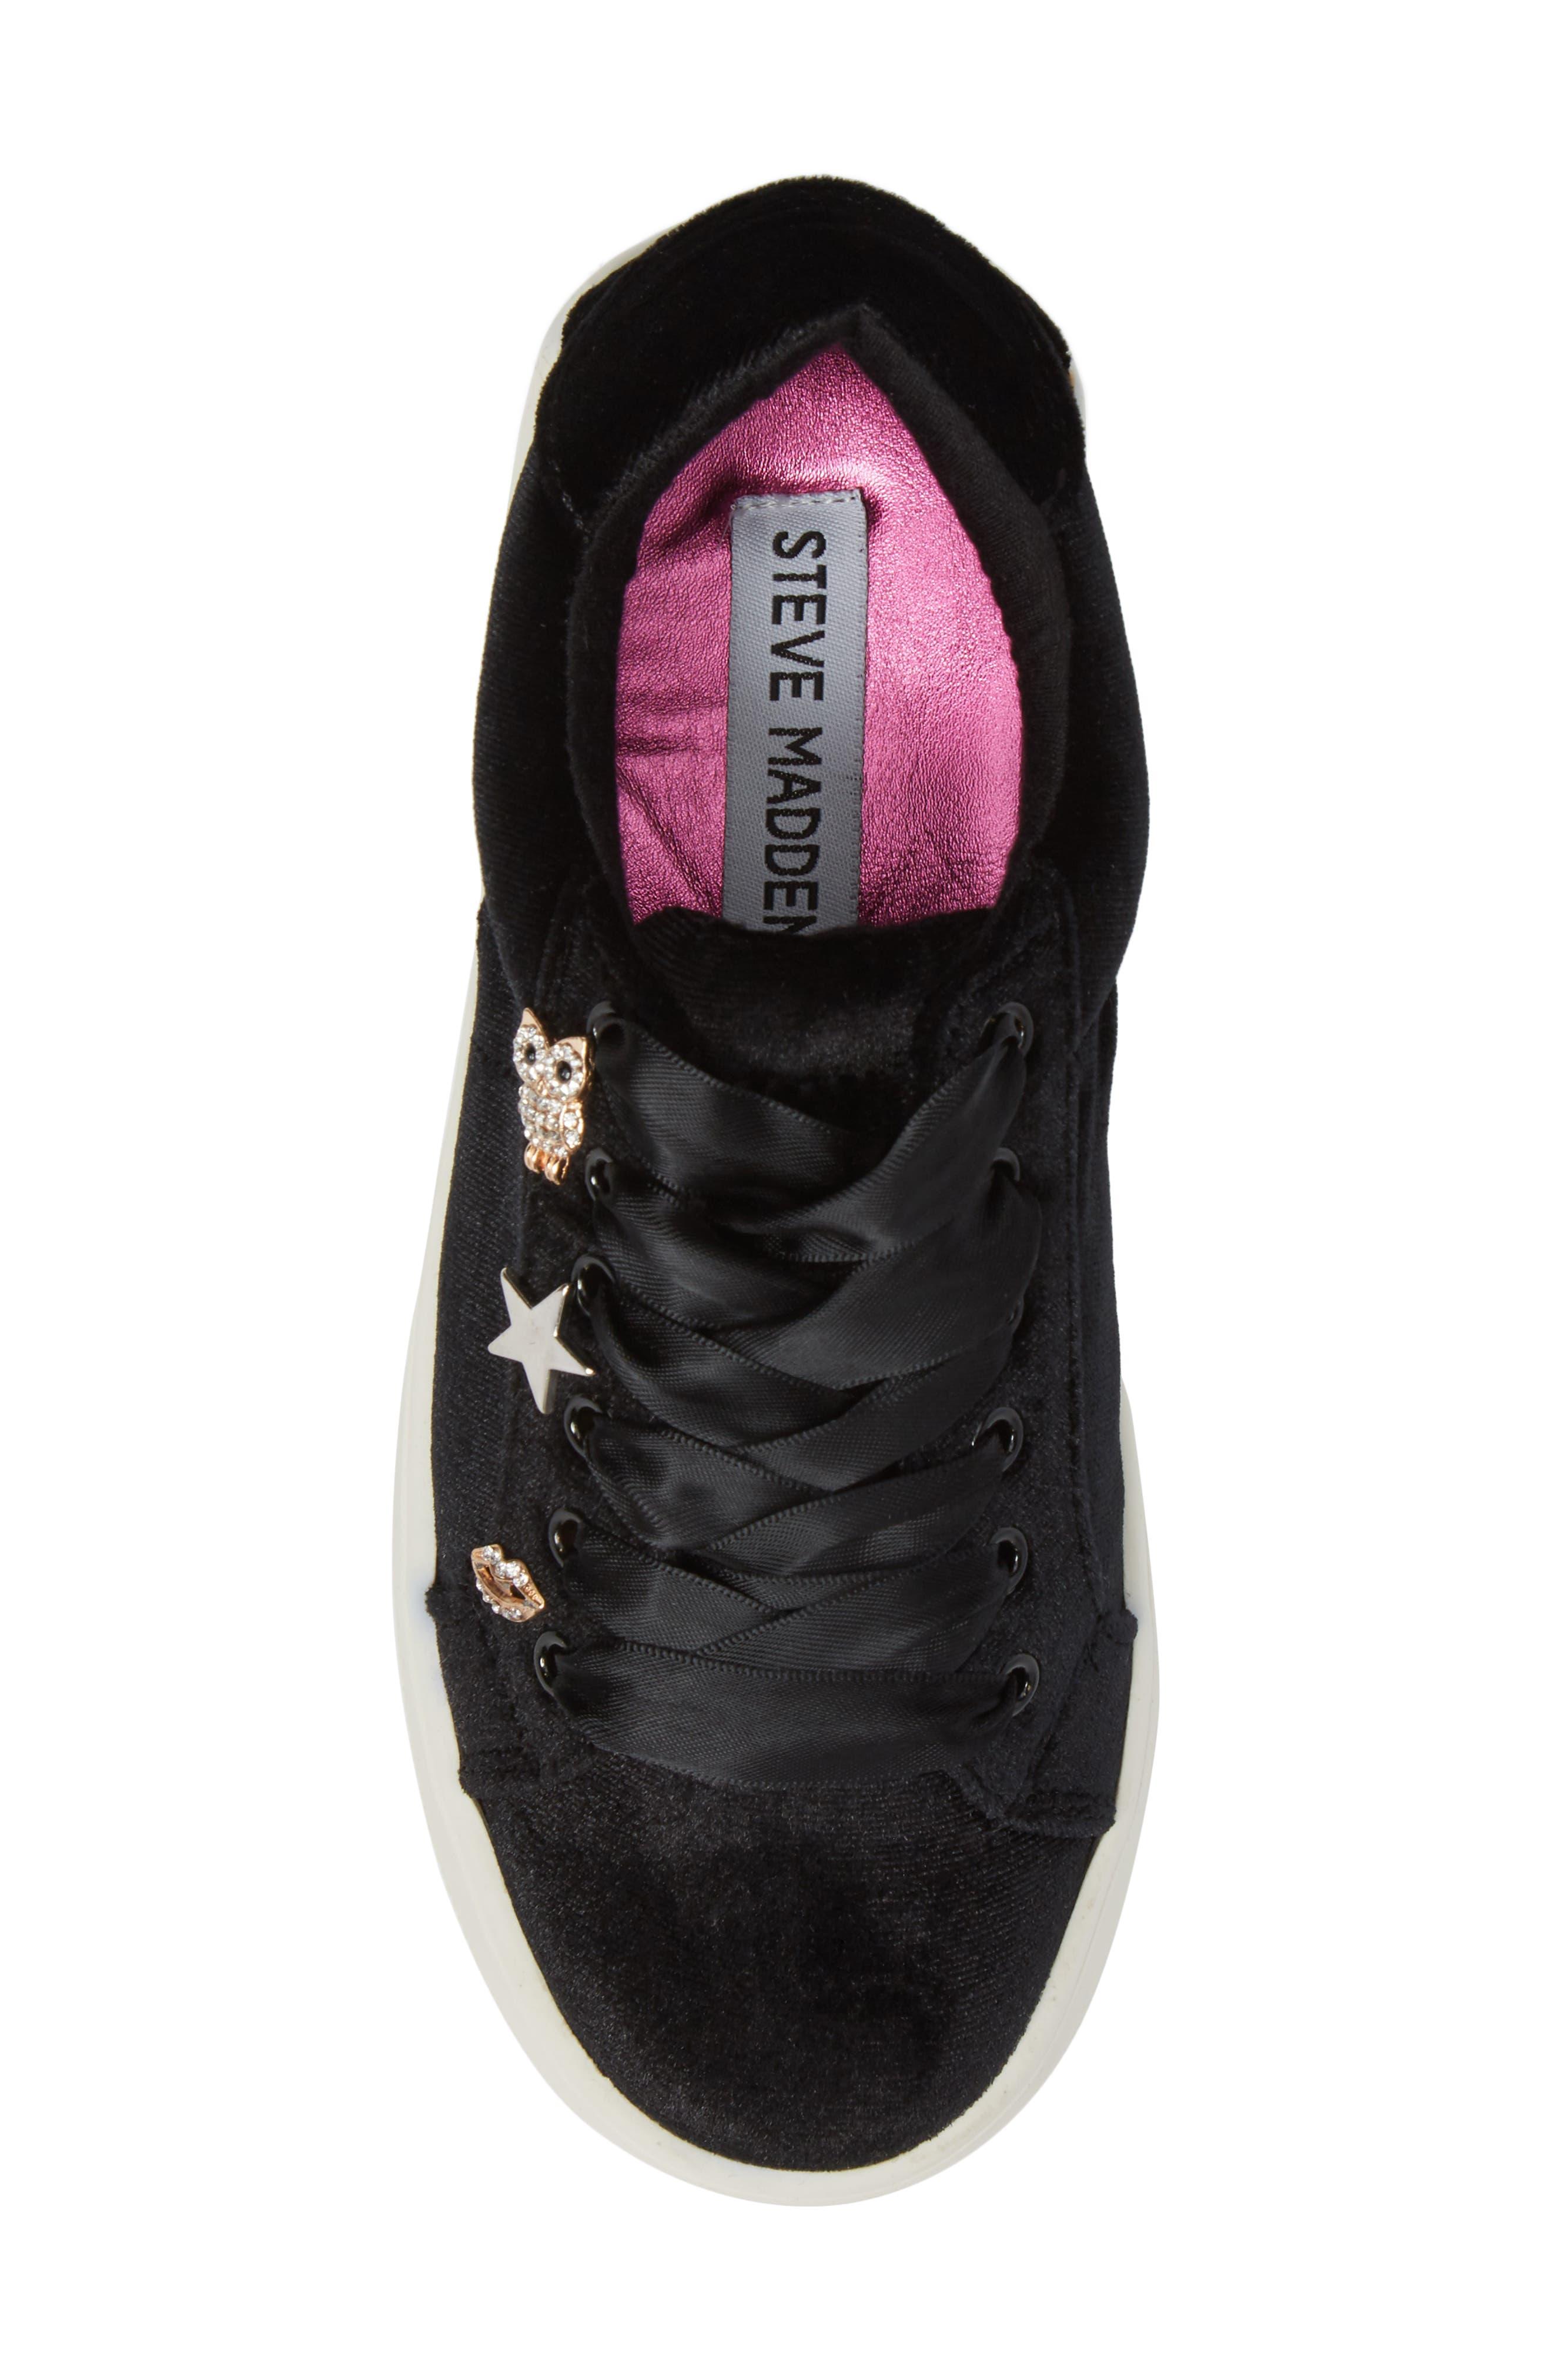 Jbertiec Charm Sneaker,                             Alternate thumbnail 5, color,                             009